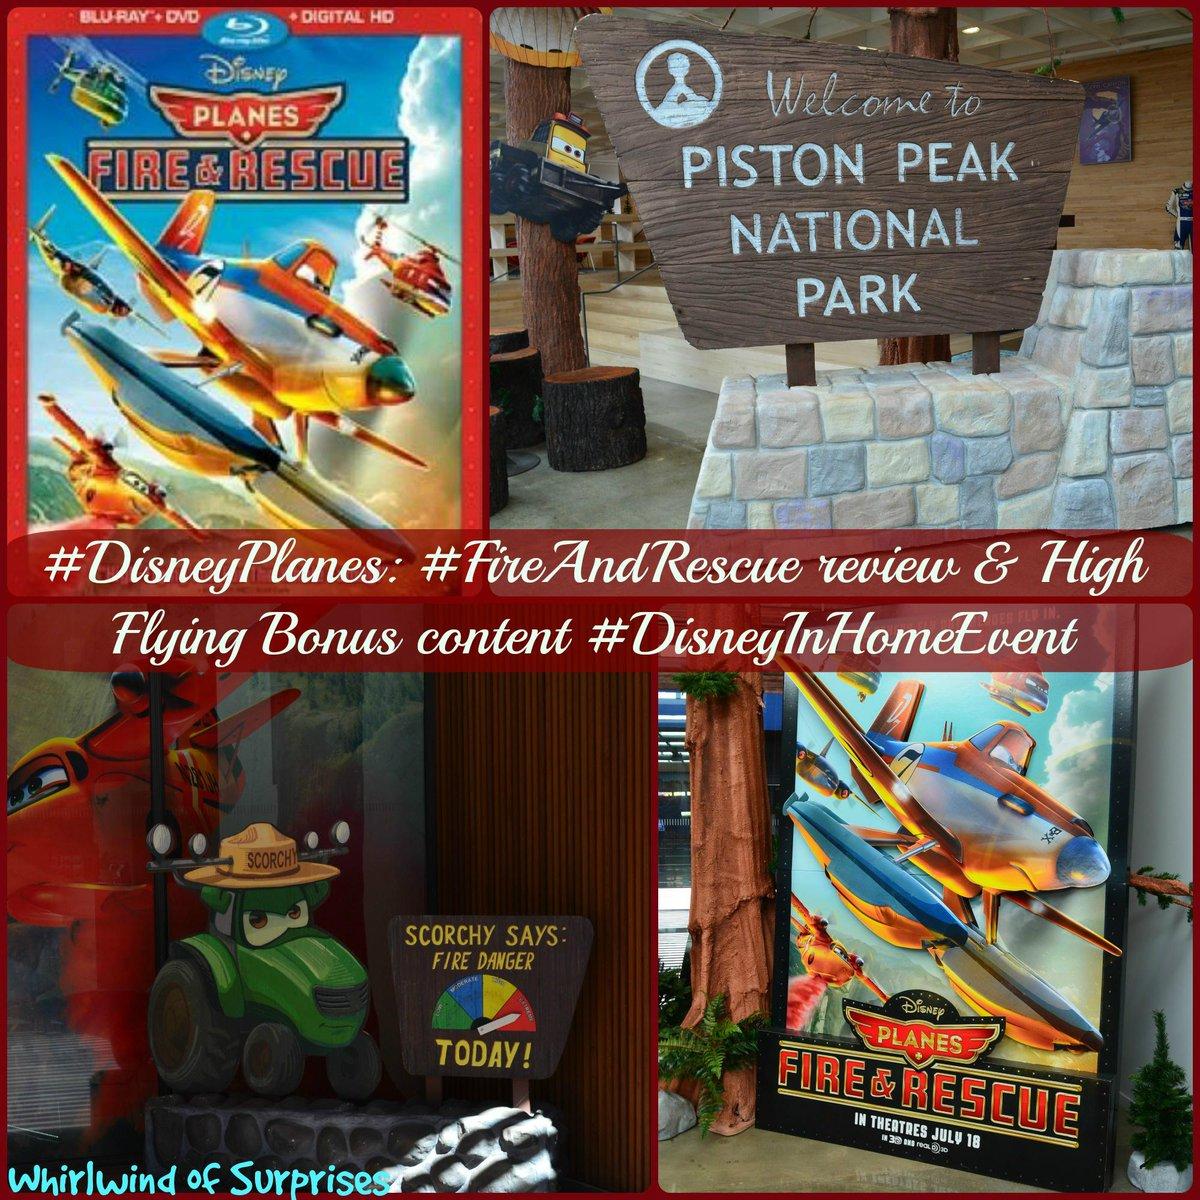 Disney Planes: #FireAndRescue Review and bonus content overview